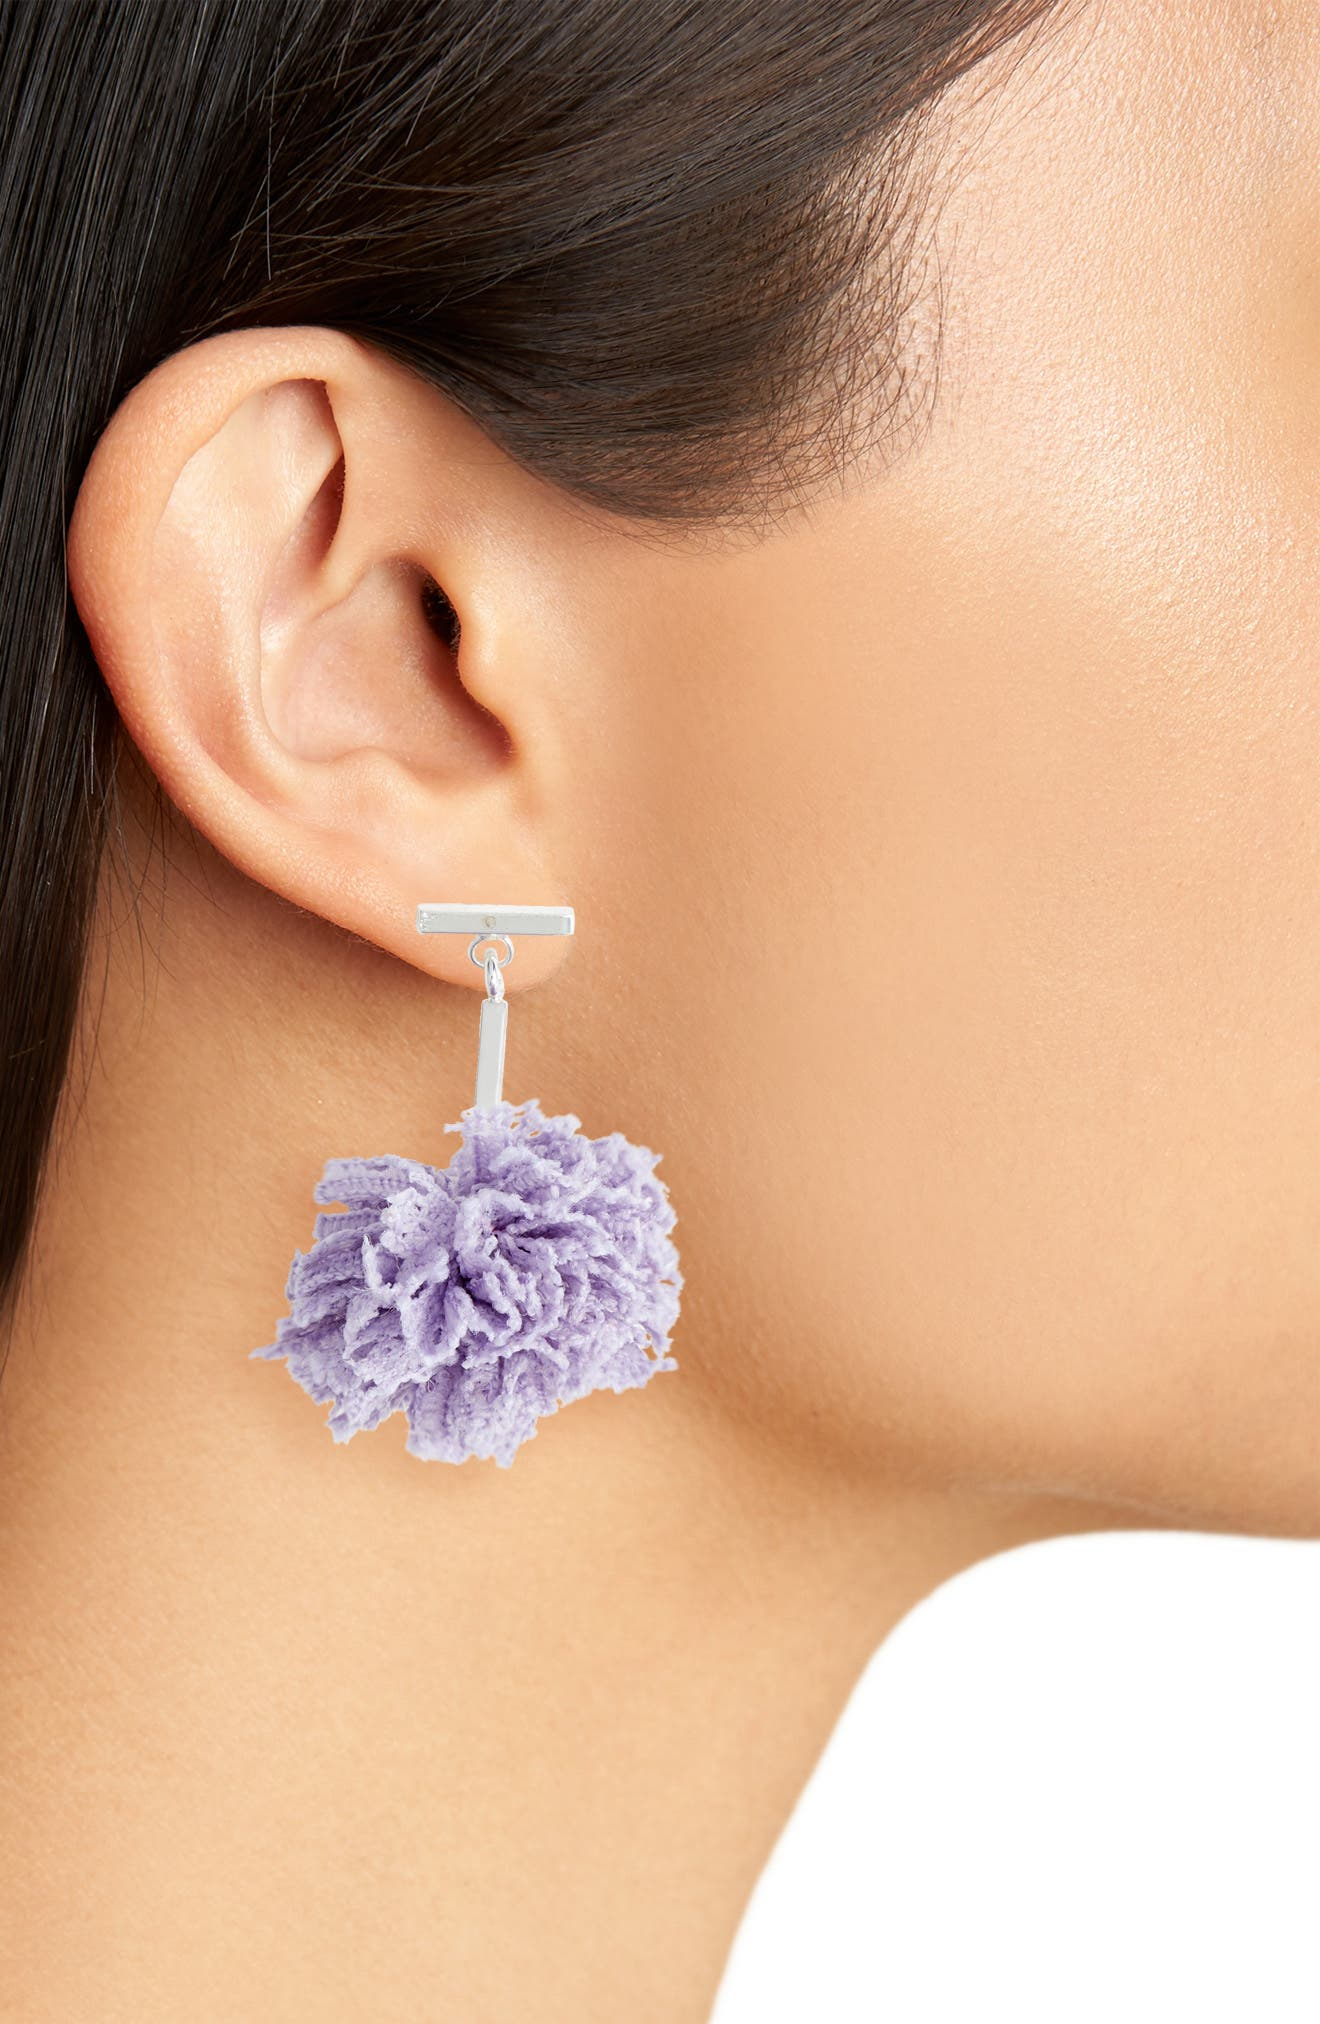 Lace Pom Pom T-Bar Stud Earrings,                             Alternate thumbnail 2, color,                             Silver/ Lavender